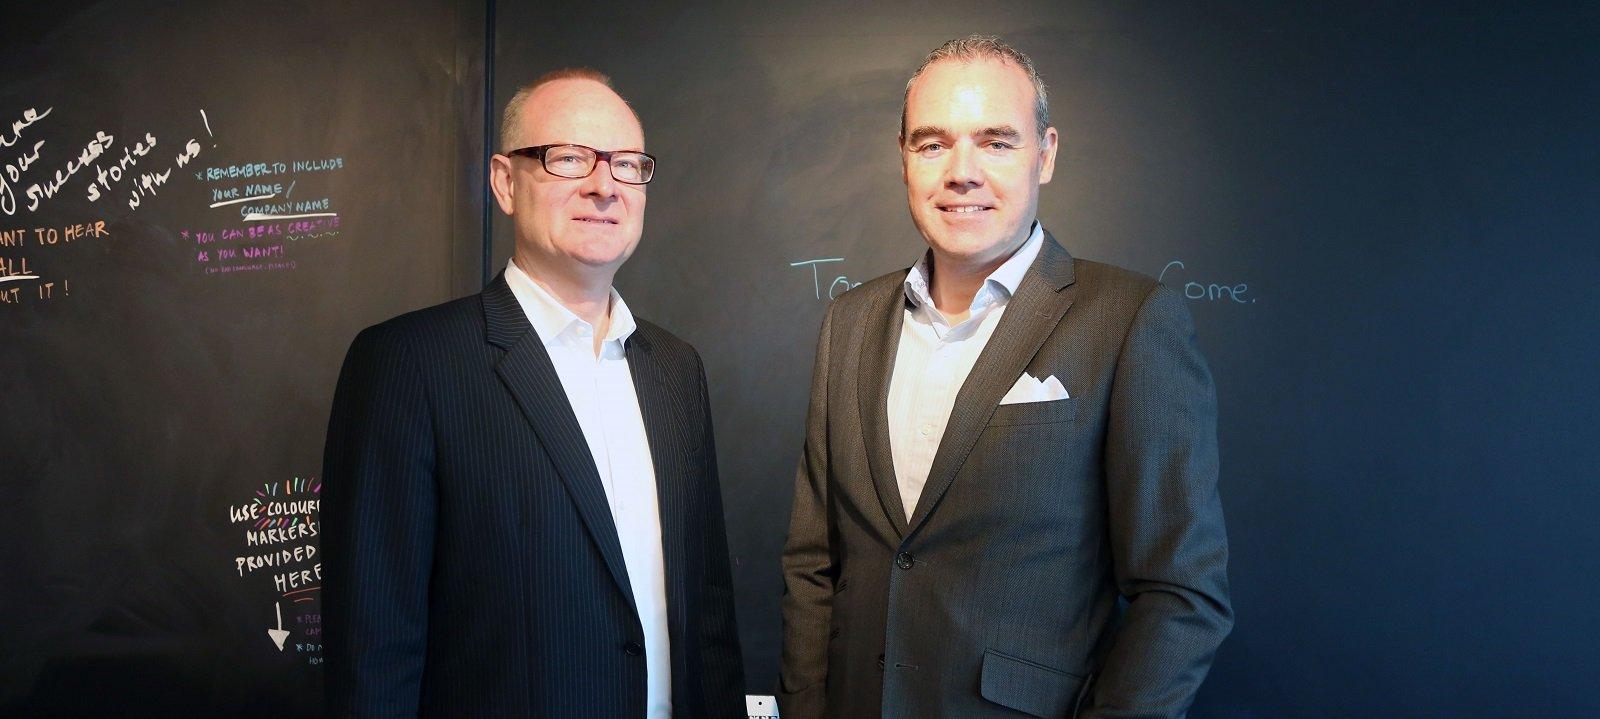 Cocoon Capital Appoints Martin Roll as Senior Advisor - Nov 2017